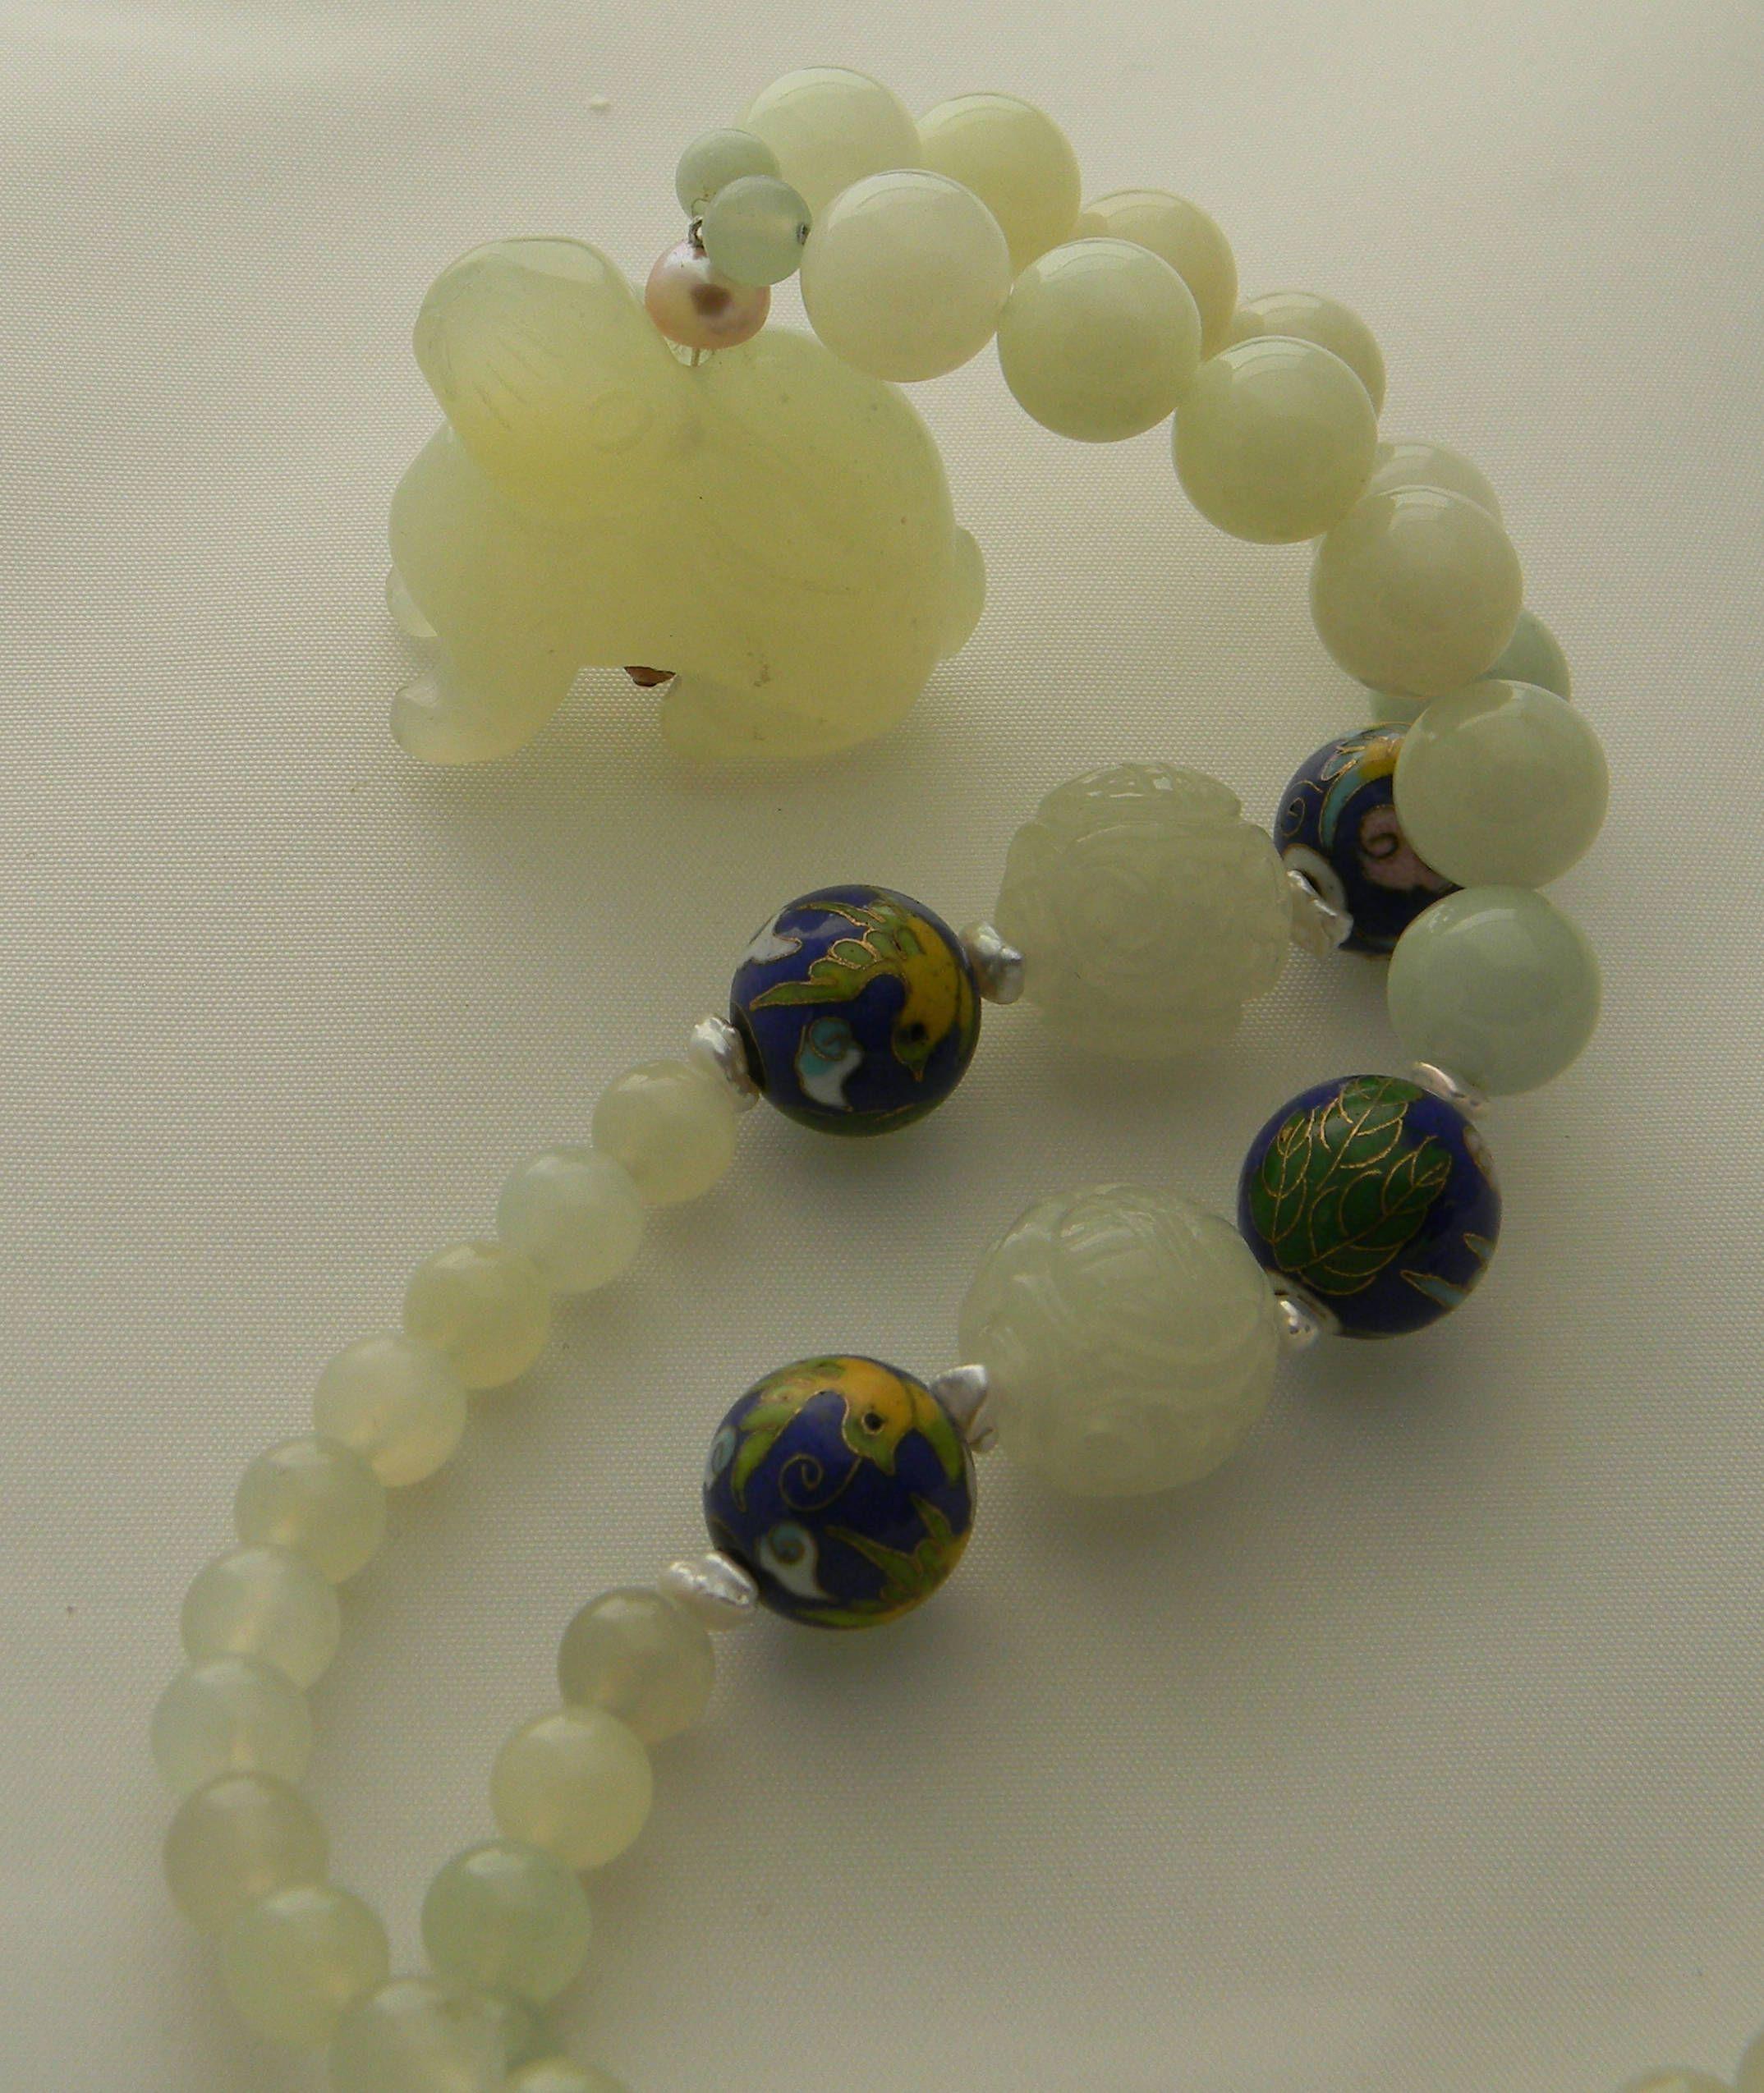 New jade rabbit pendant on jade beads jade charms necklace with new jade rabbit pendant on jade beads jade charms necklace with chinese vintage cloisonne aloadofball Images